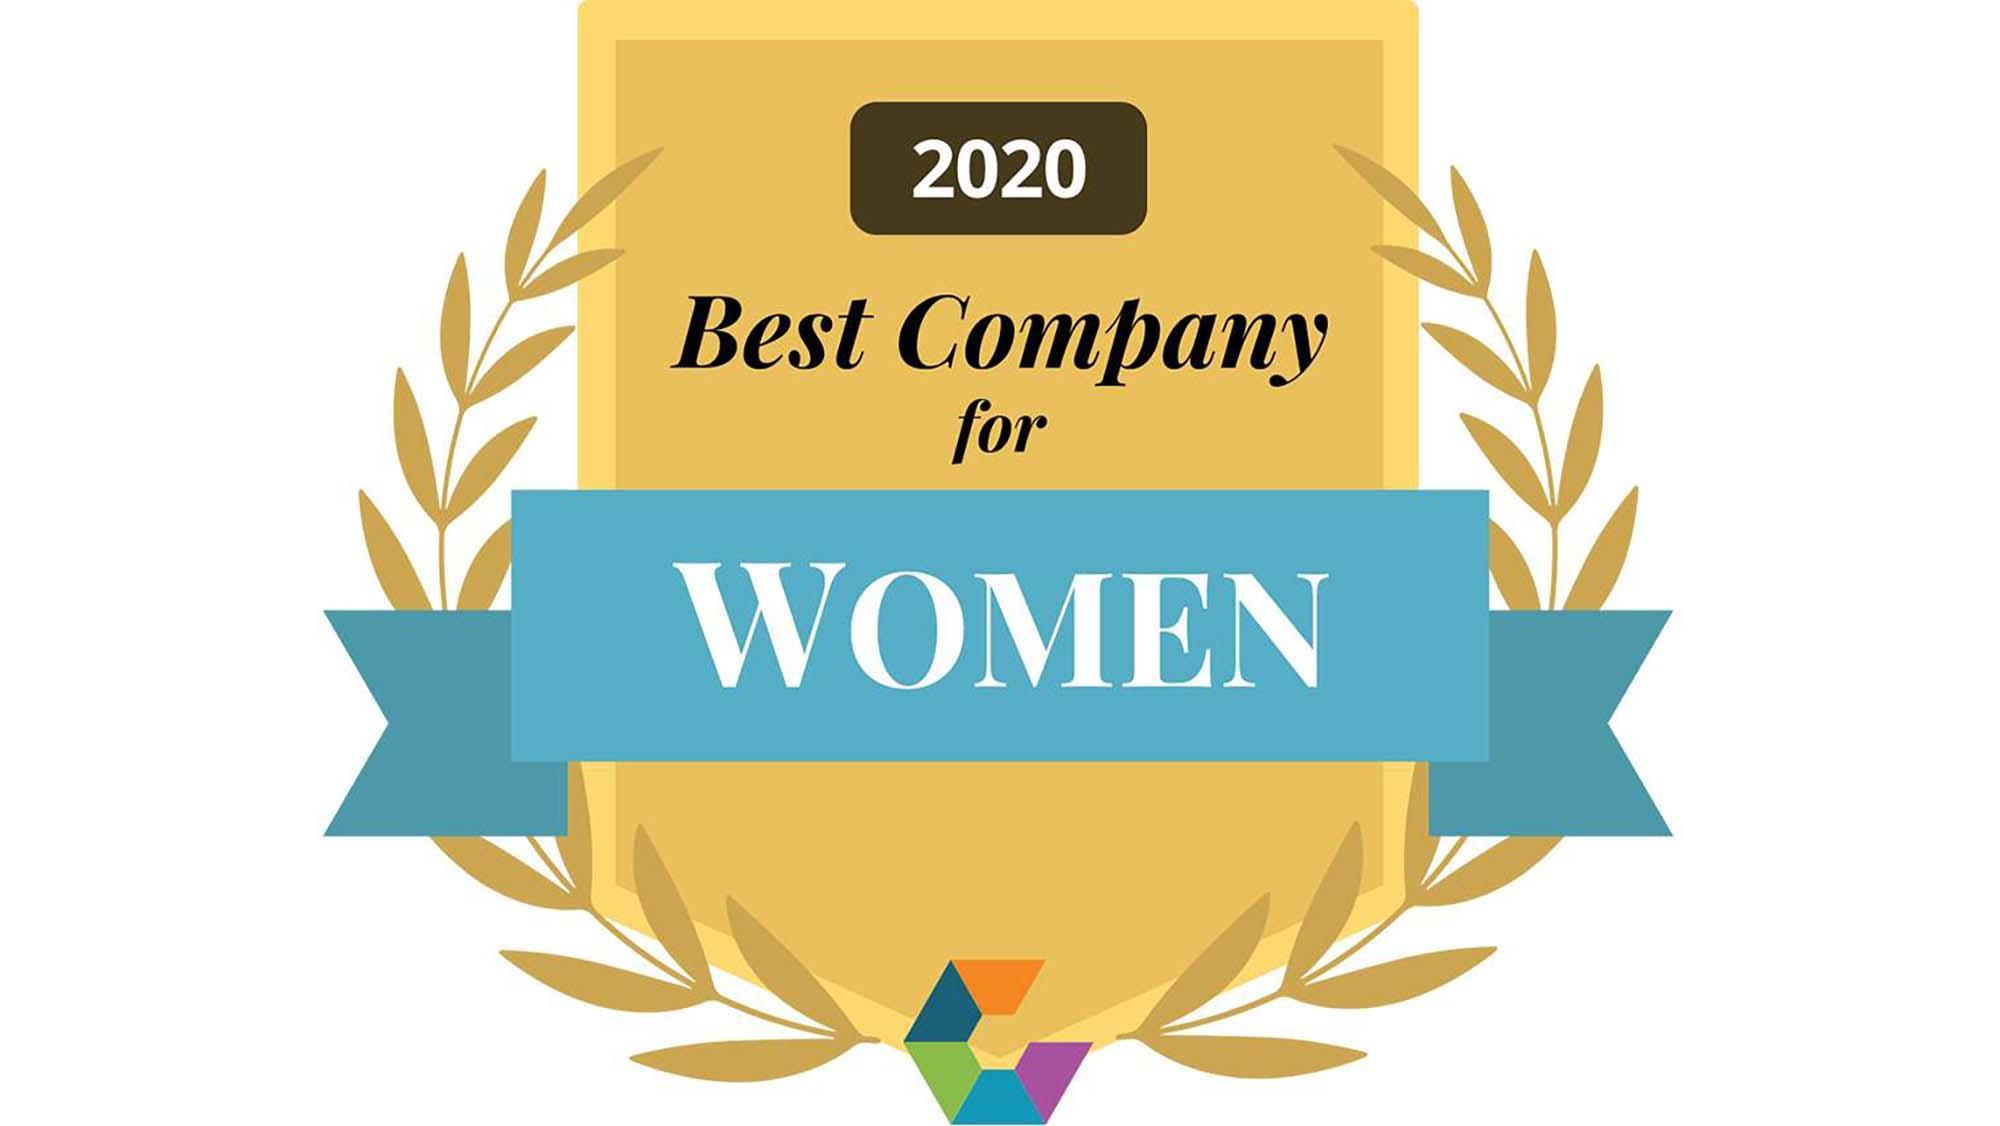 2020 Best Company for Women